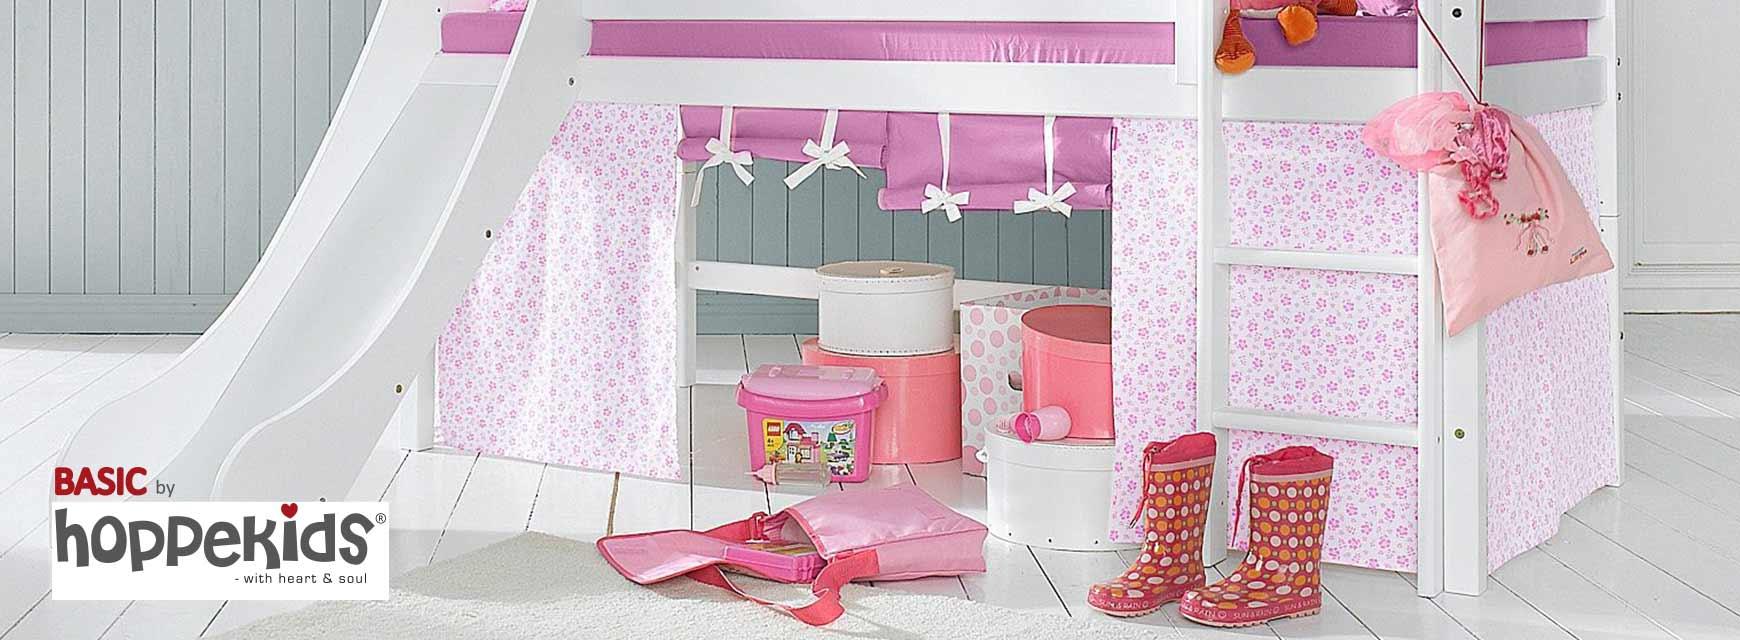 Full Size of Coole Kinderbetten Hoppekids Sitzscke In Groer Auswahl Betten T Shirt Sprüche T Shirt Wohnzimmer Coole Kinderbetten